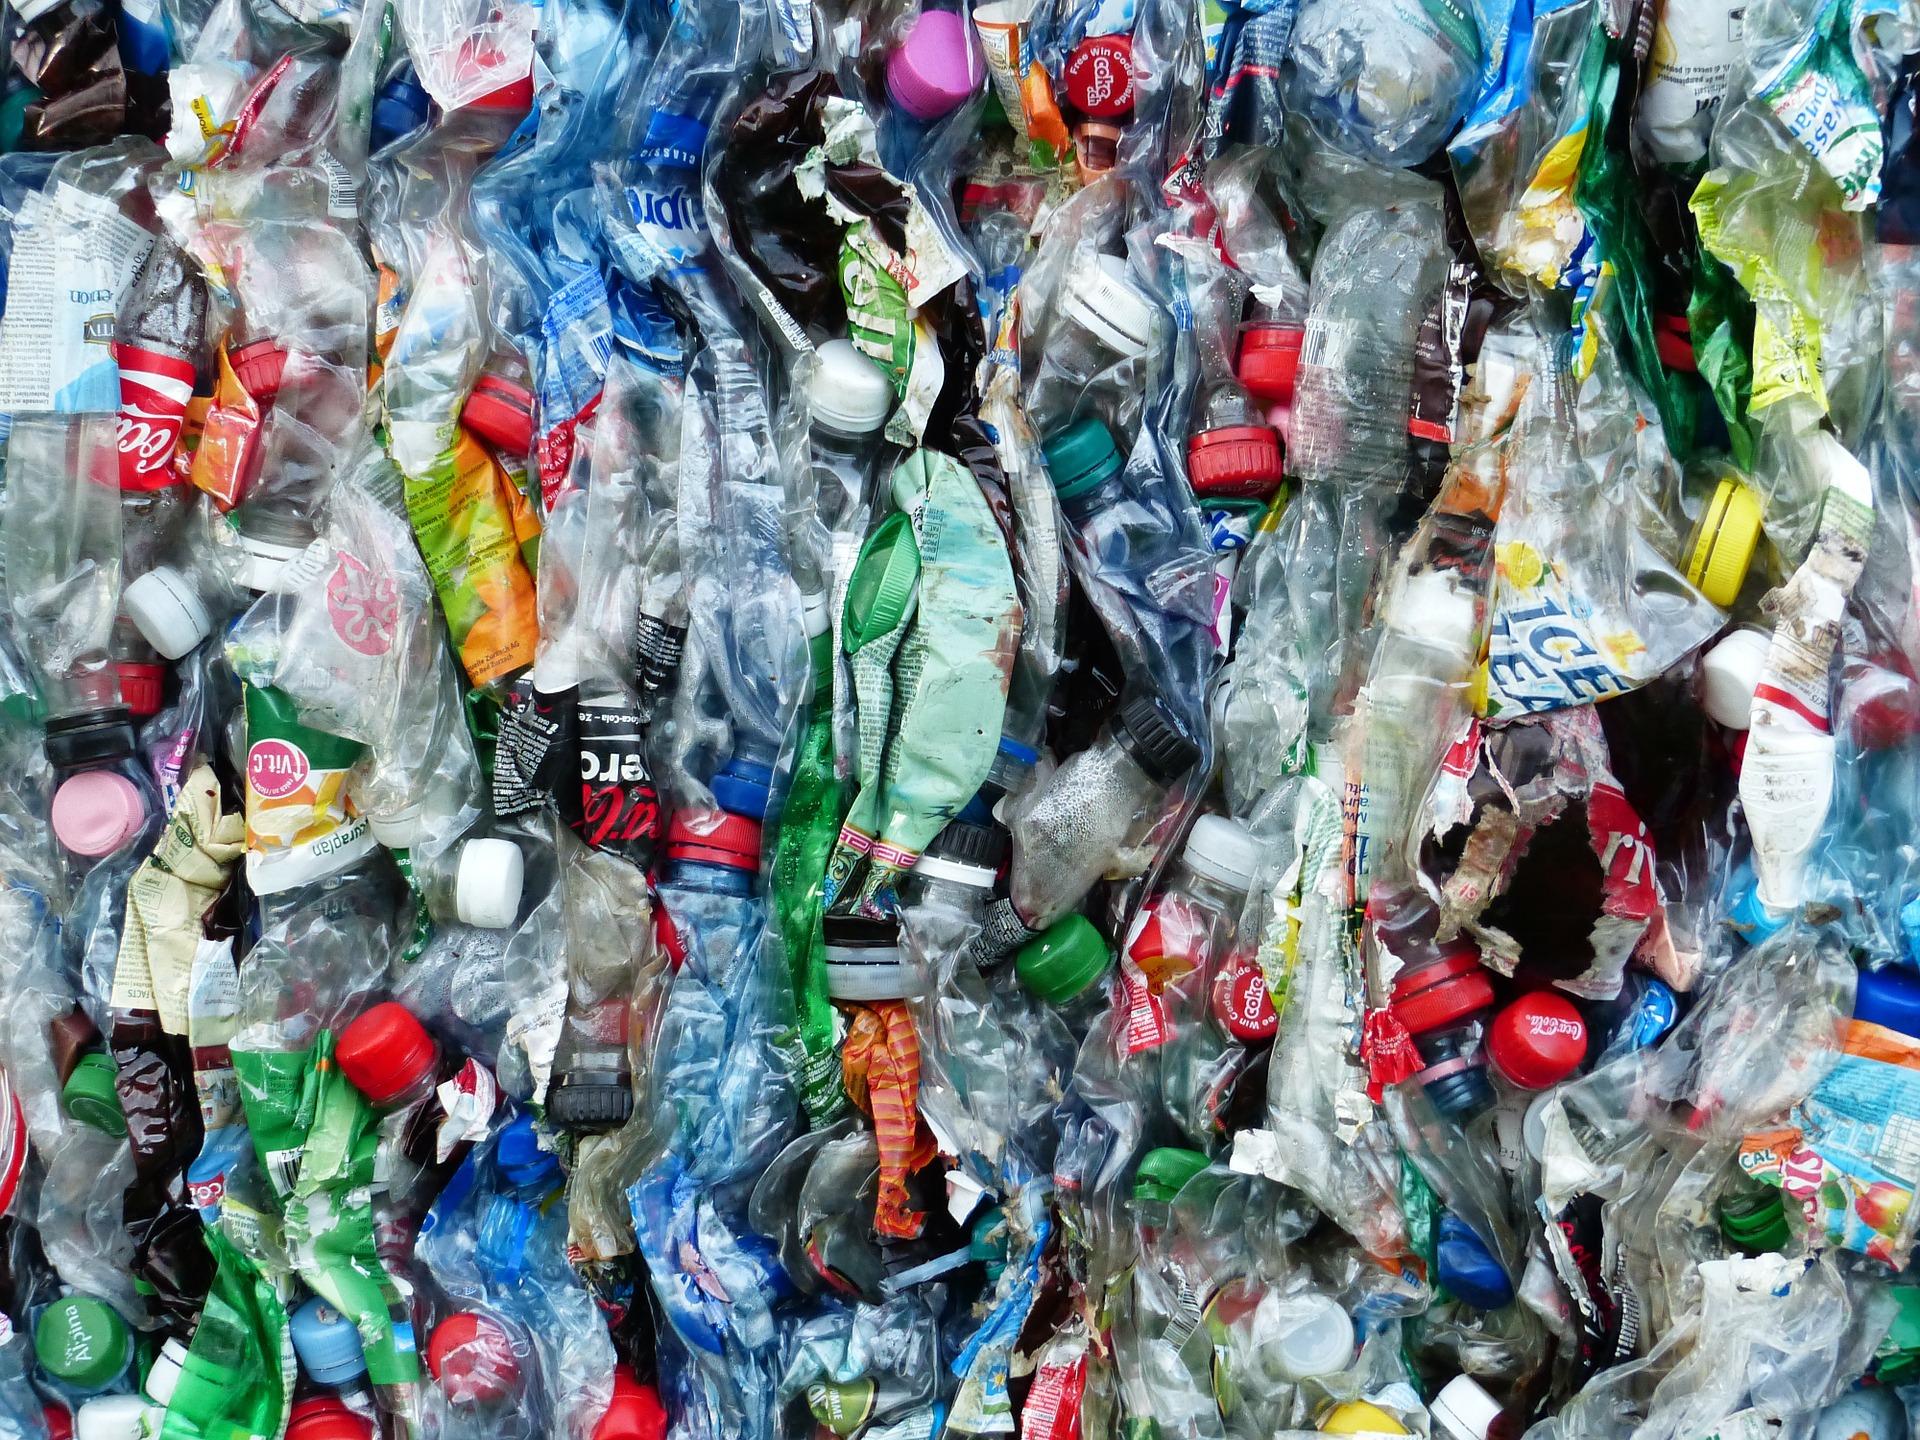 bron: pixabay.com/nl/plastic-flessen-flessen-recycling-115071/